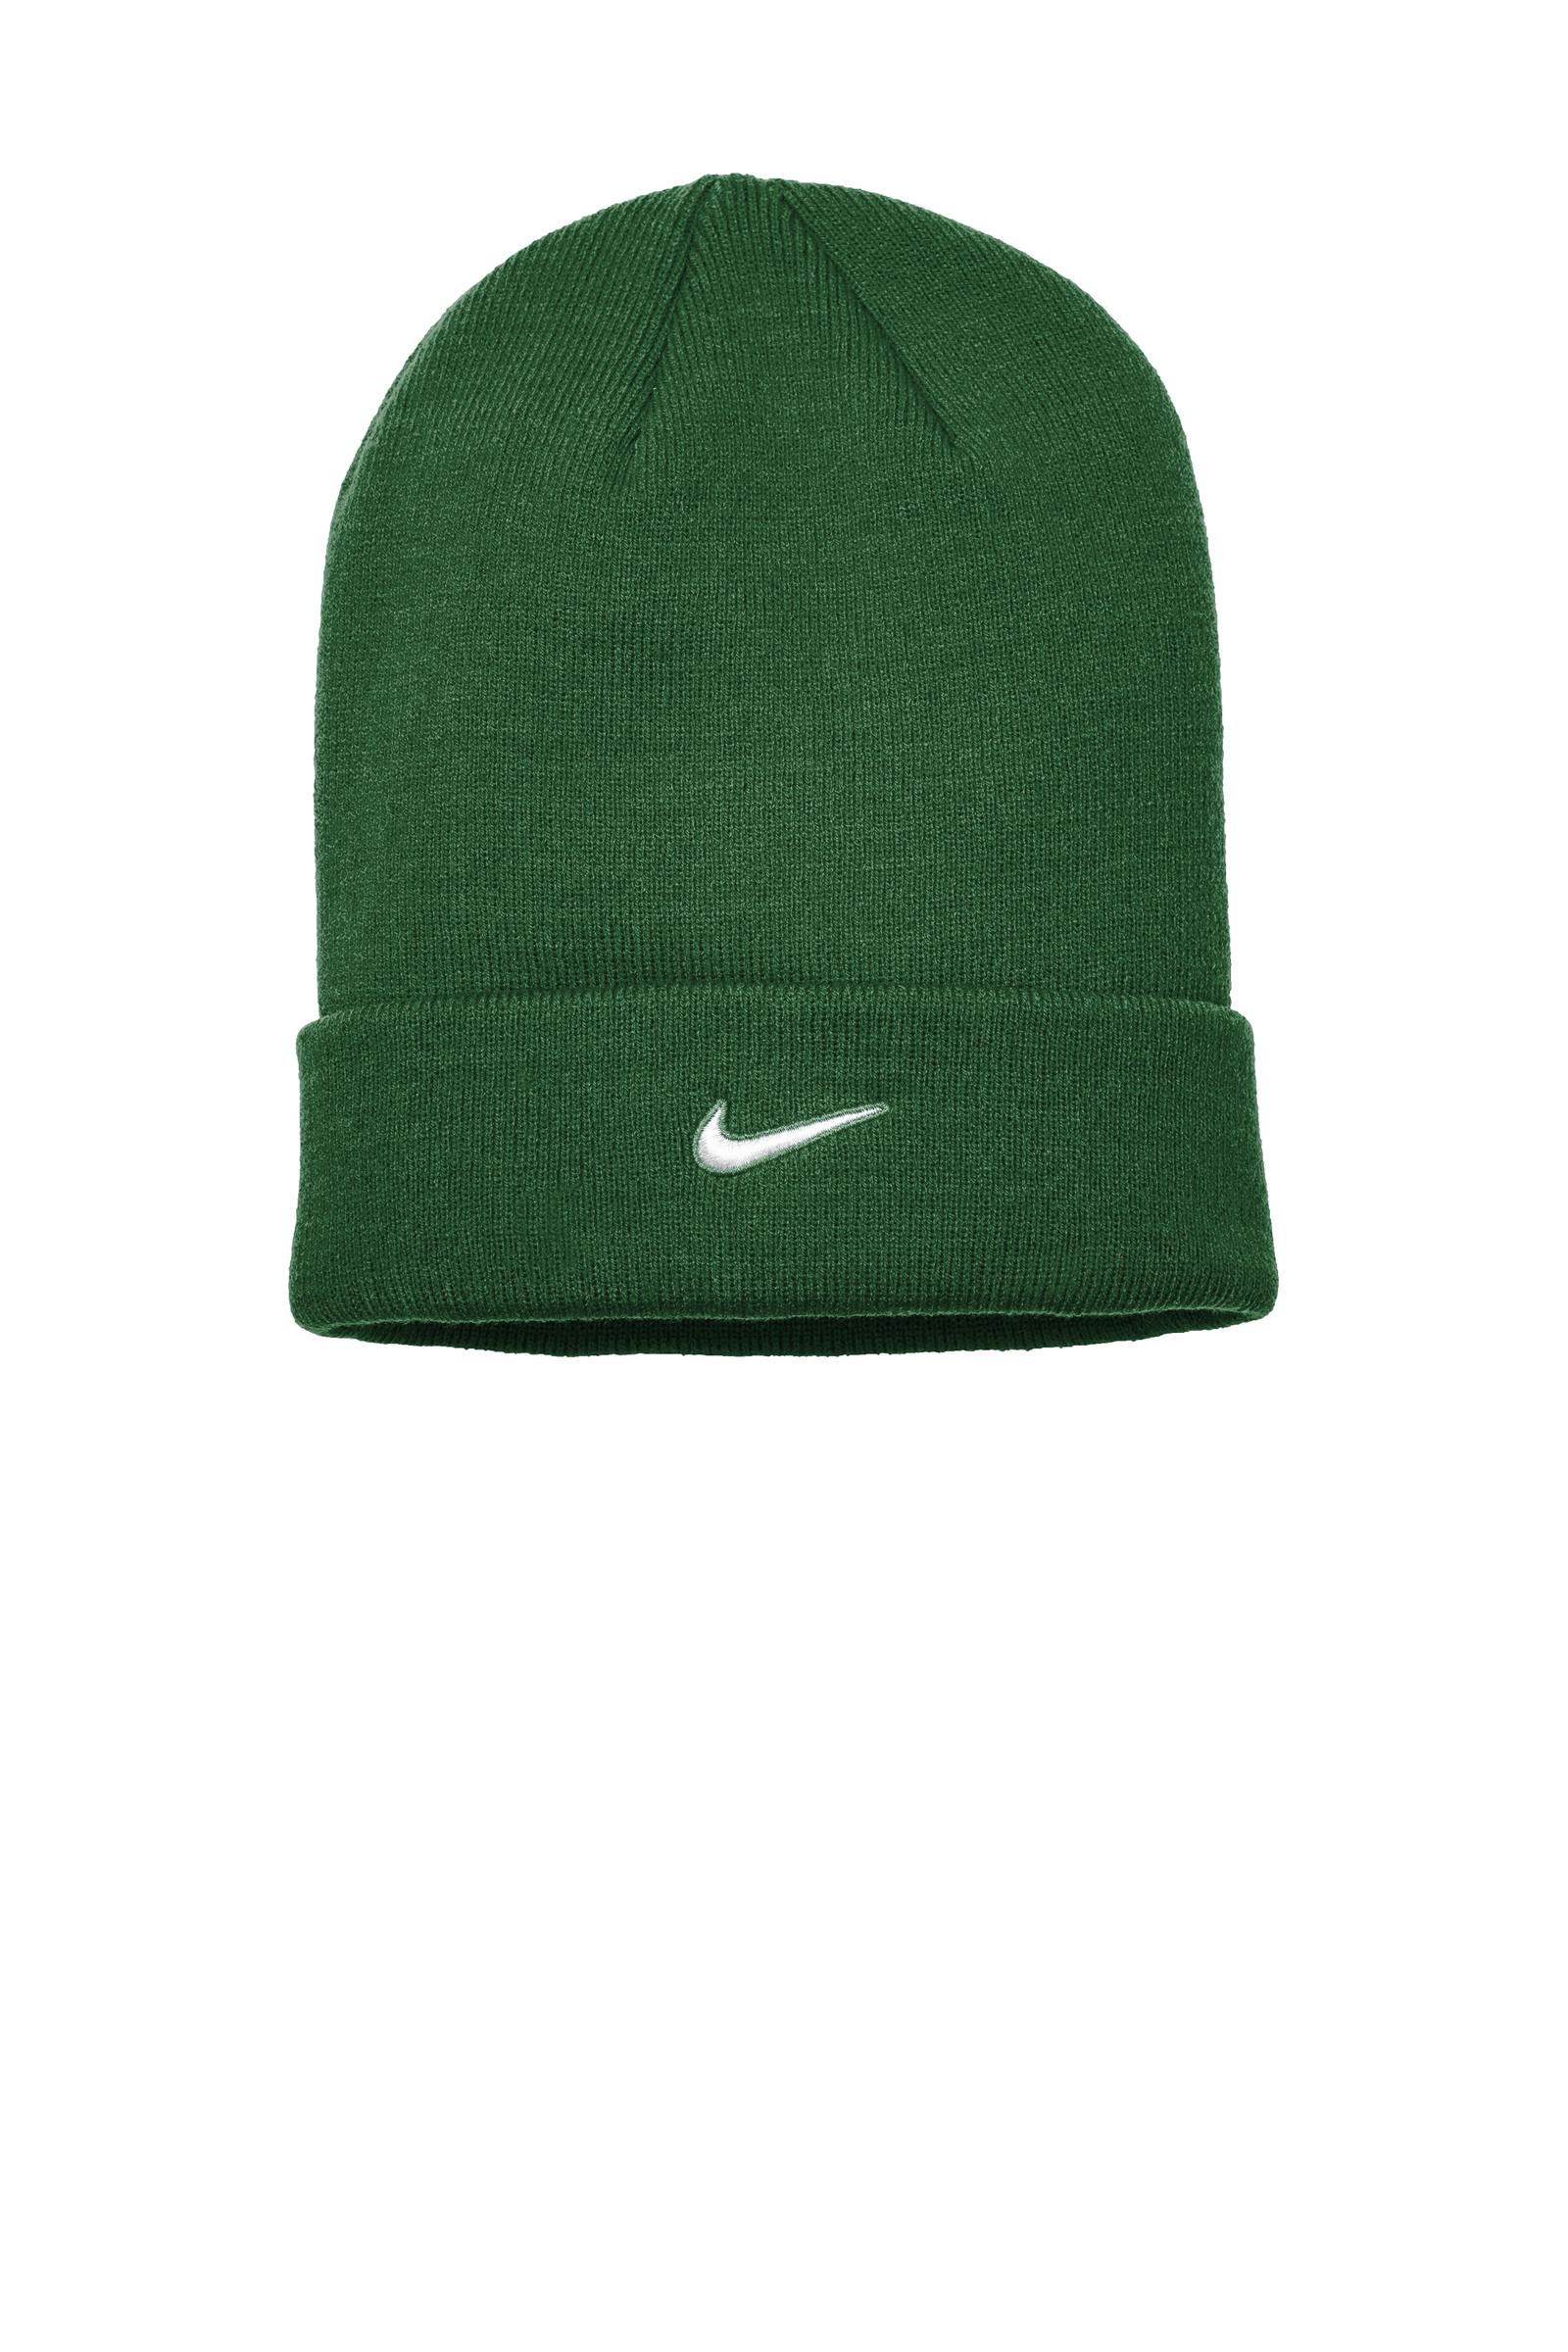 Nike Embroidered Sideline Beanie